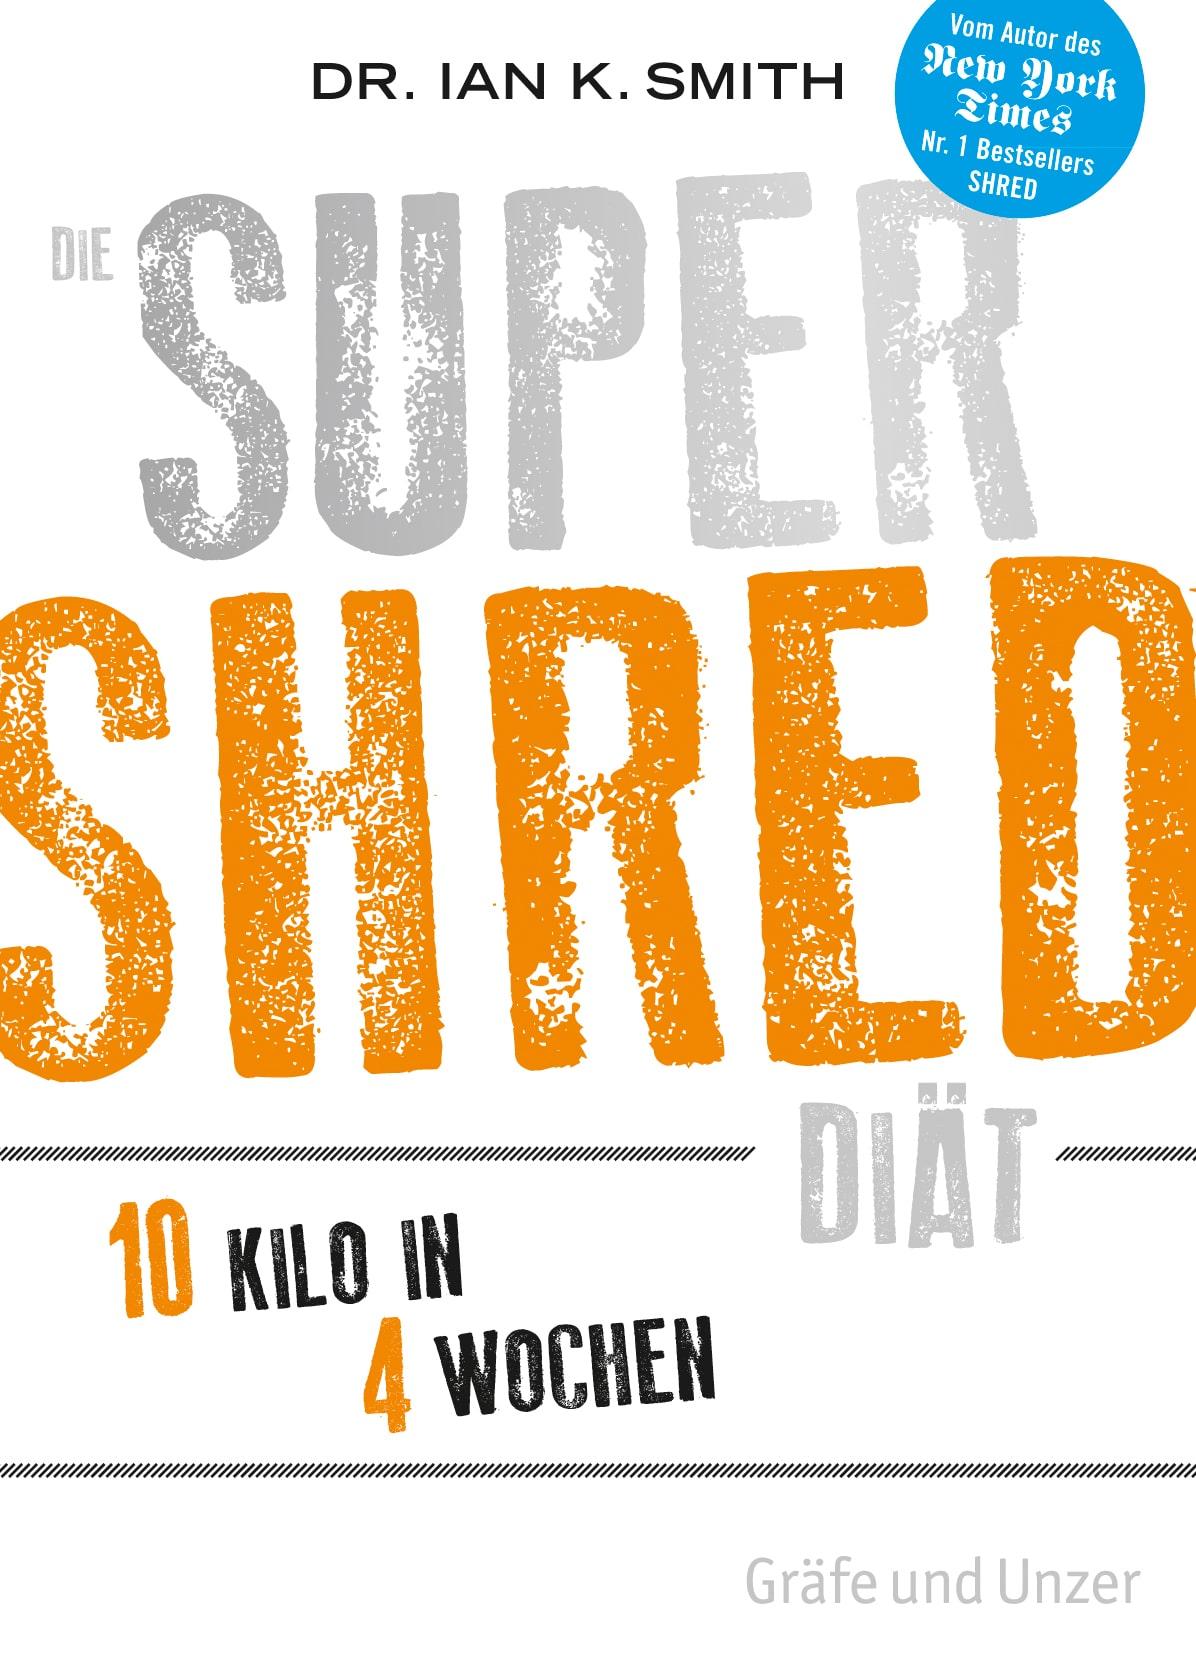 Die SUPER SHRED Diät - Buch (Softcover)